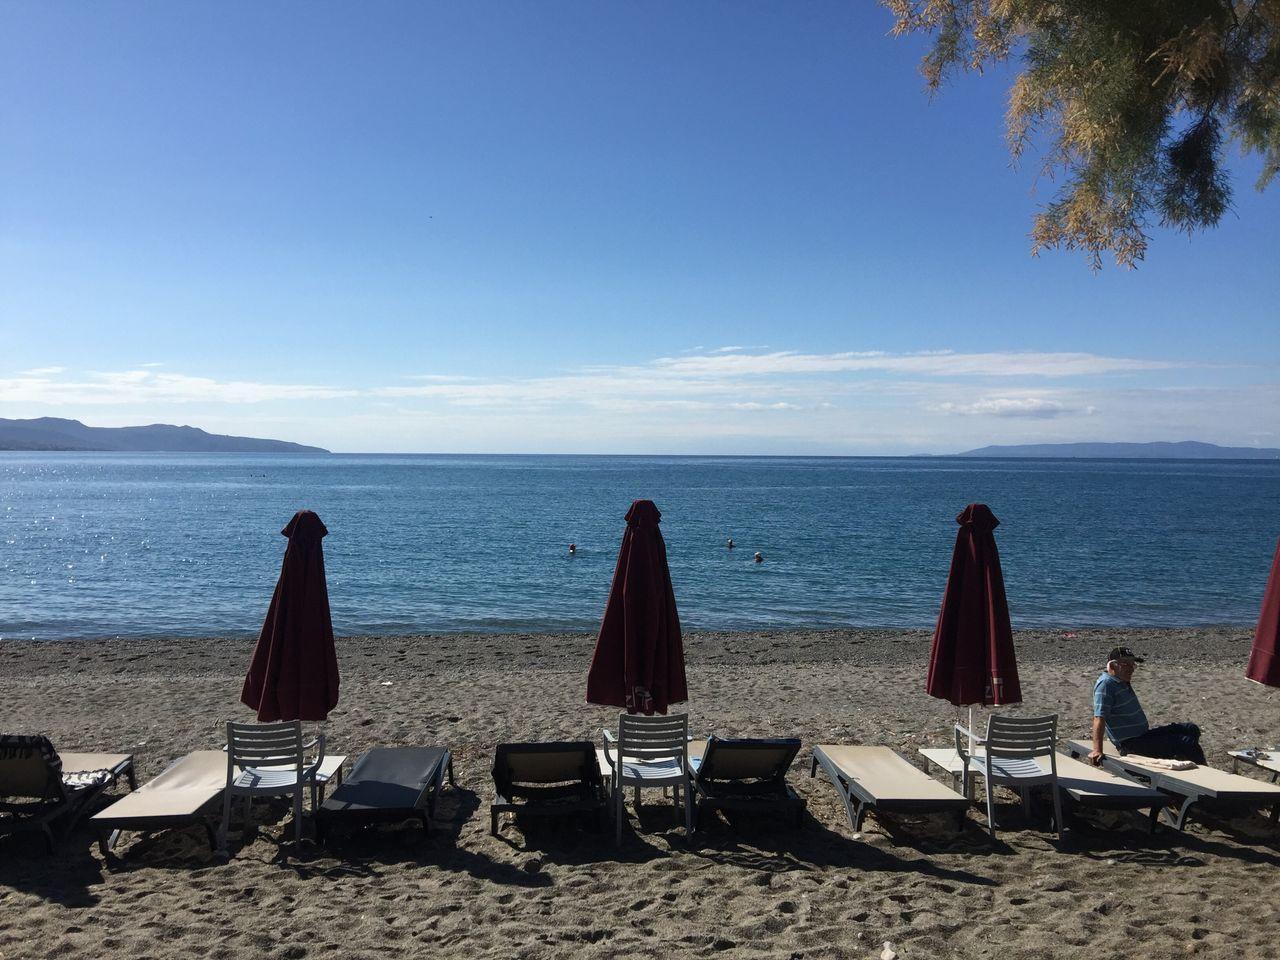 To warm you up till next summer. Greece Photos Kalamata Beach Sea Scenics Tranquil Scene Relaxation Blue Water Sand Sun Sky Peloponnese